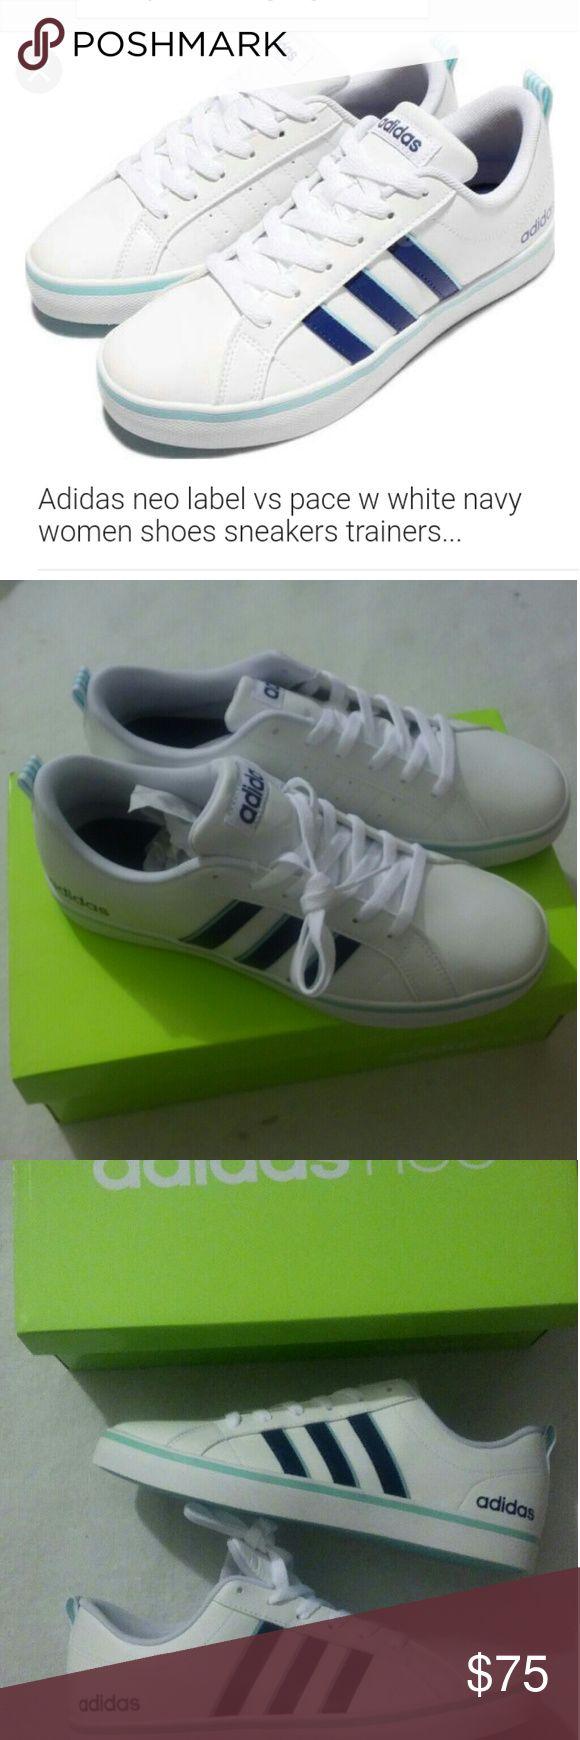 Adidas neo label vs pace w white navy women shoes Adidas neo label vs pace w white navy women shoes sneakers trainers... Sz 9 addidas  Shoes Sneakers